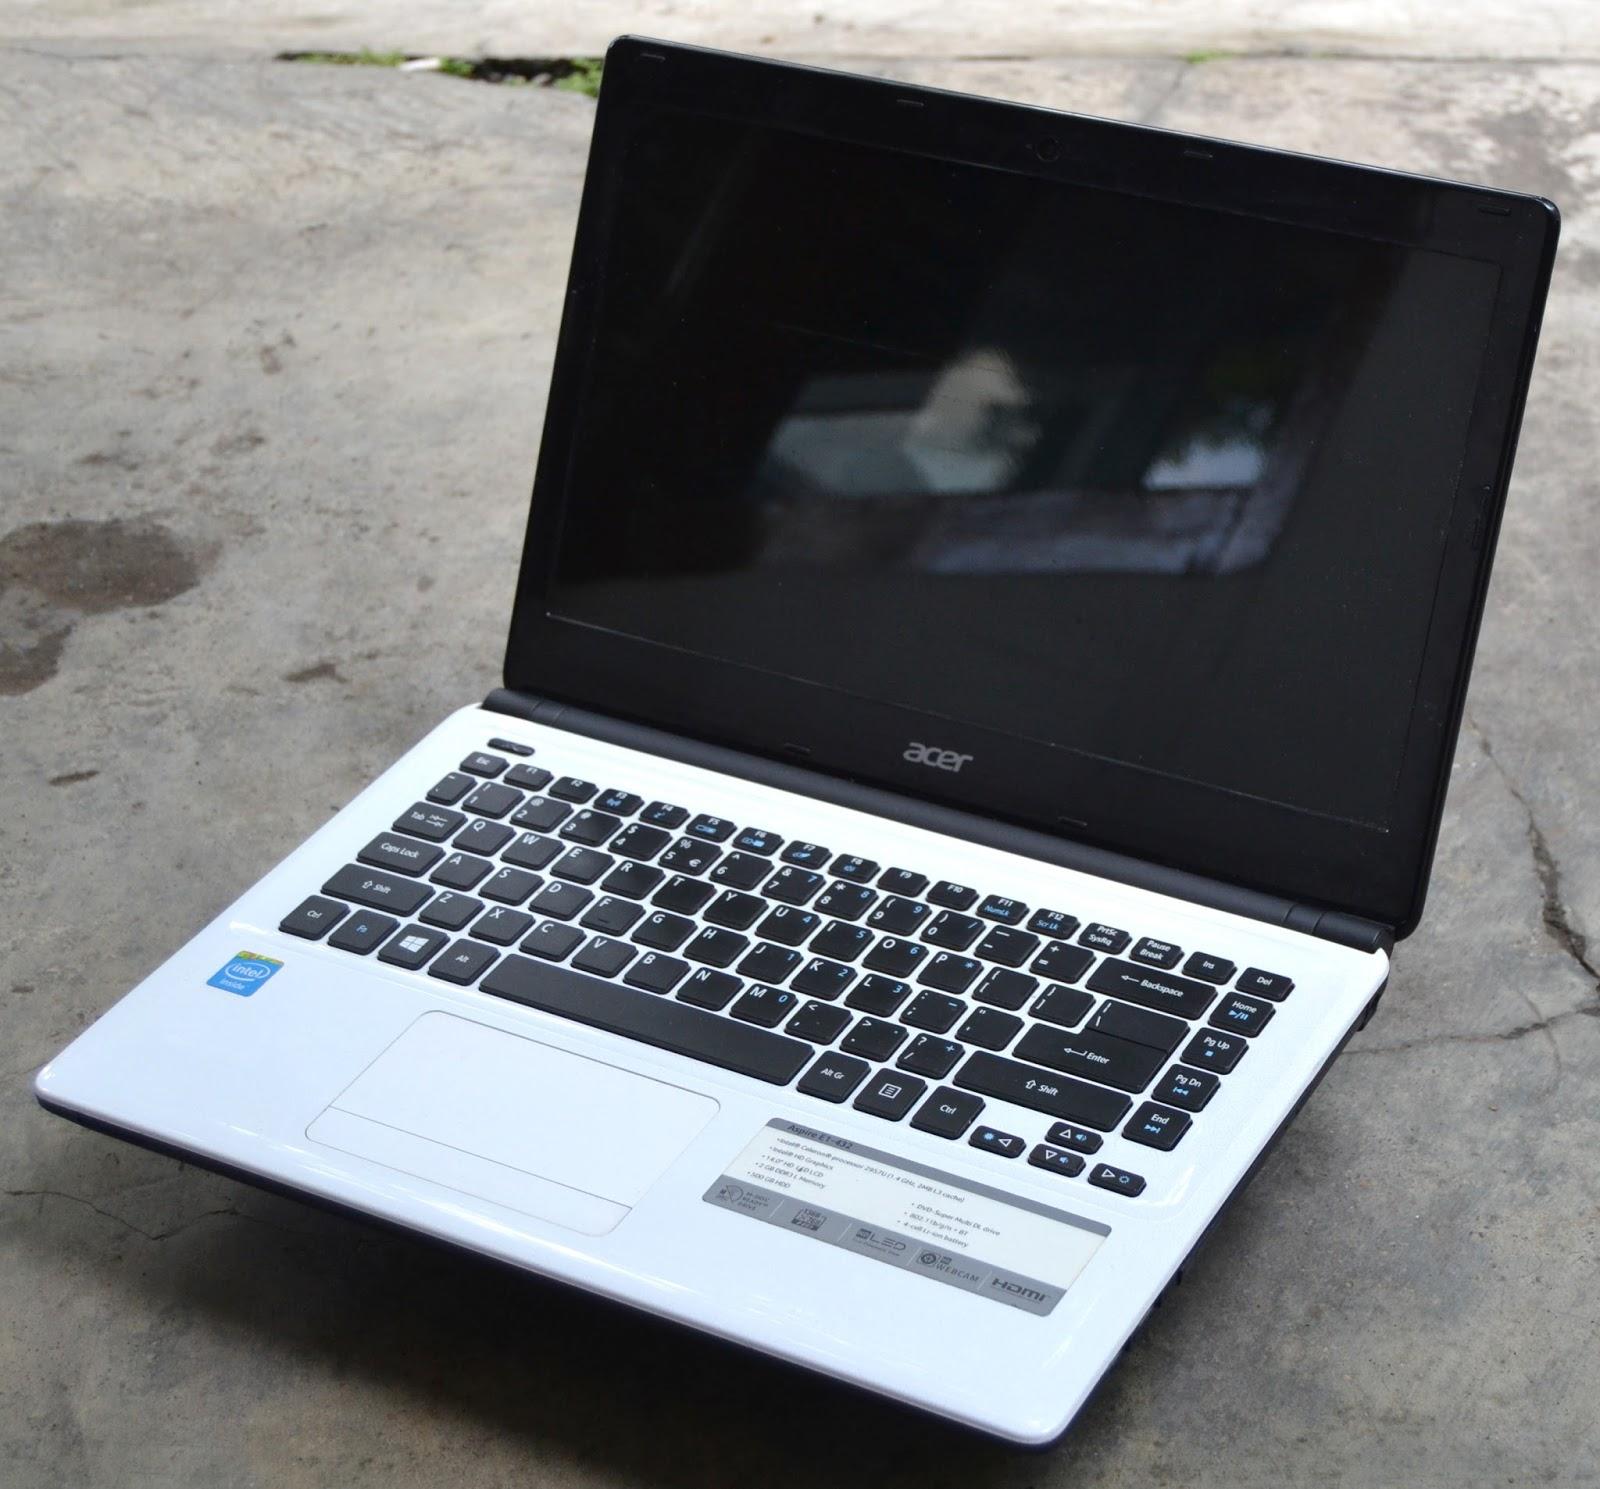 Jual Acer Aspire E1 432 Bekas Di Malang